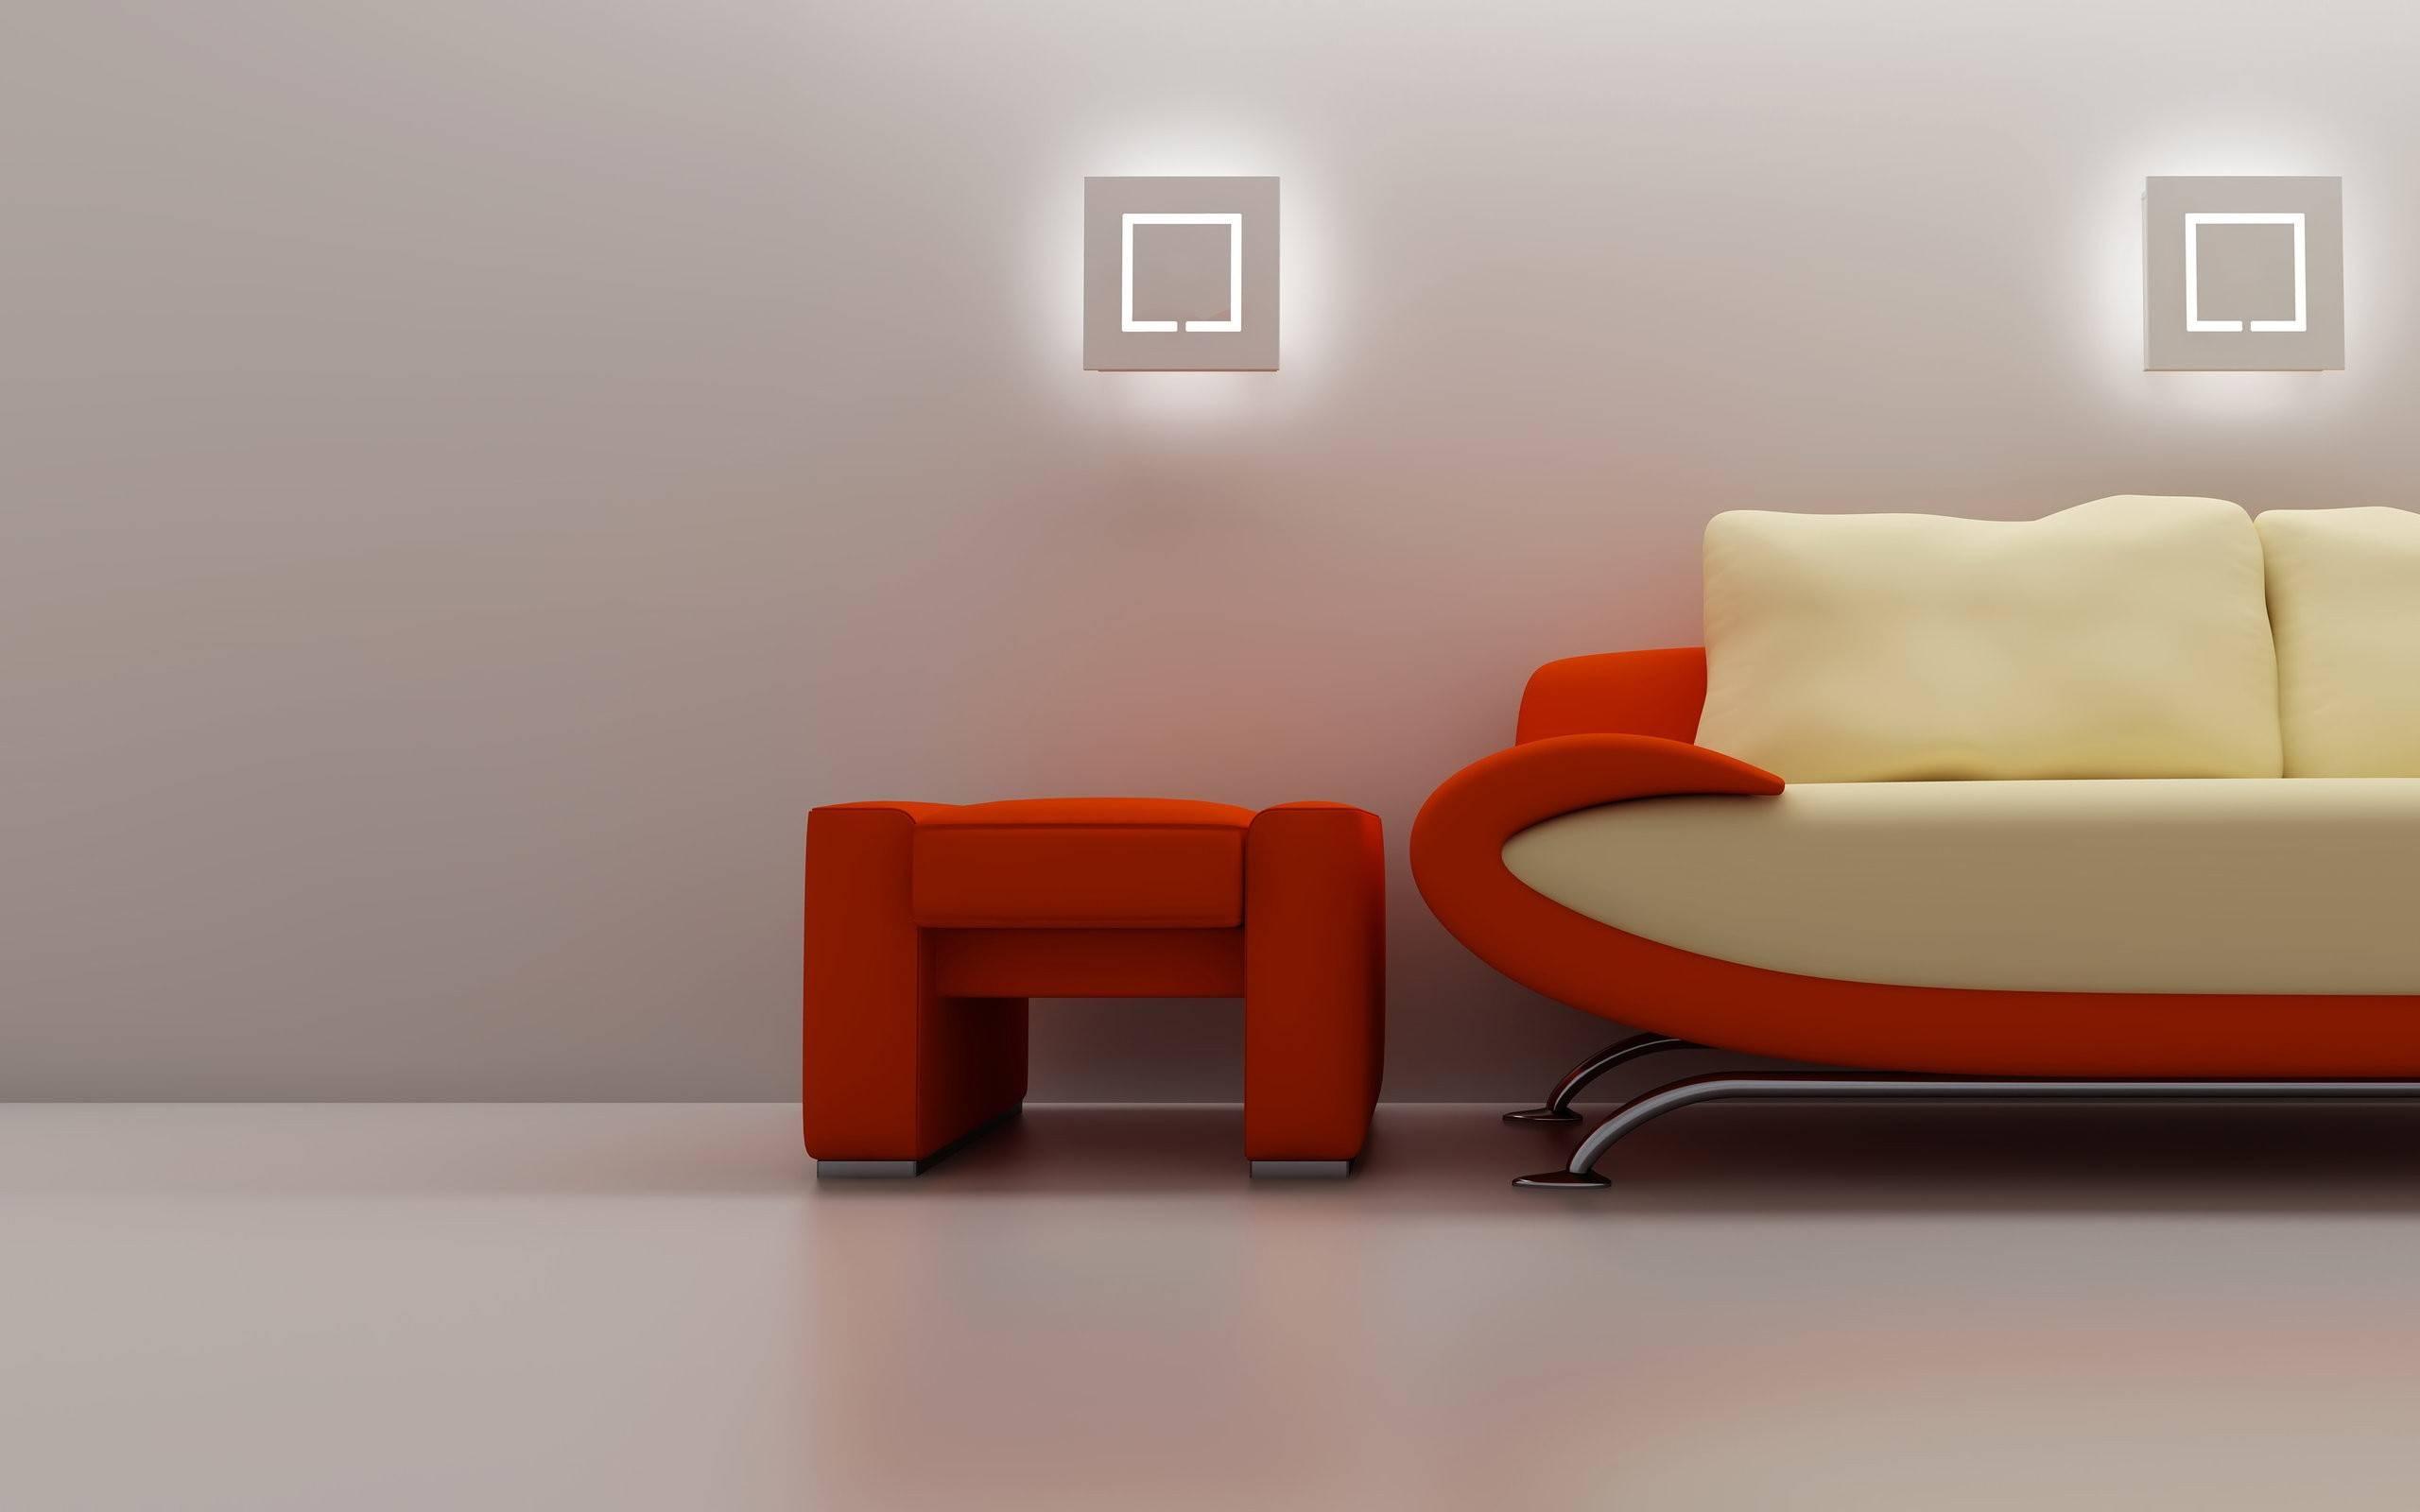 Furniture 25601600 Wallpaper 904391 2560x1600